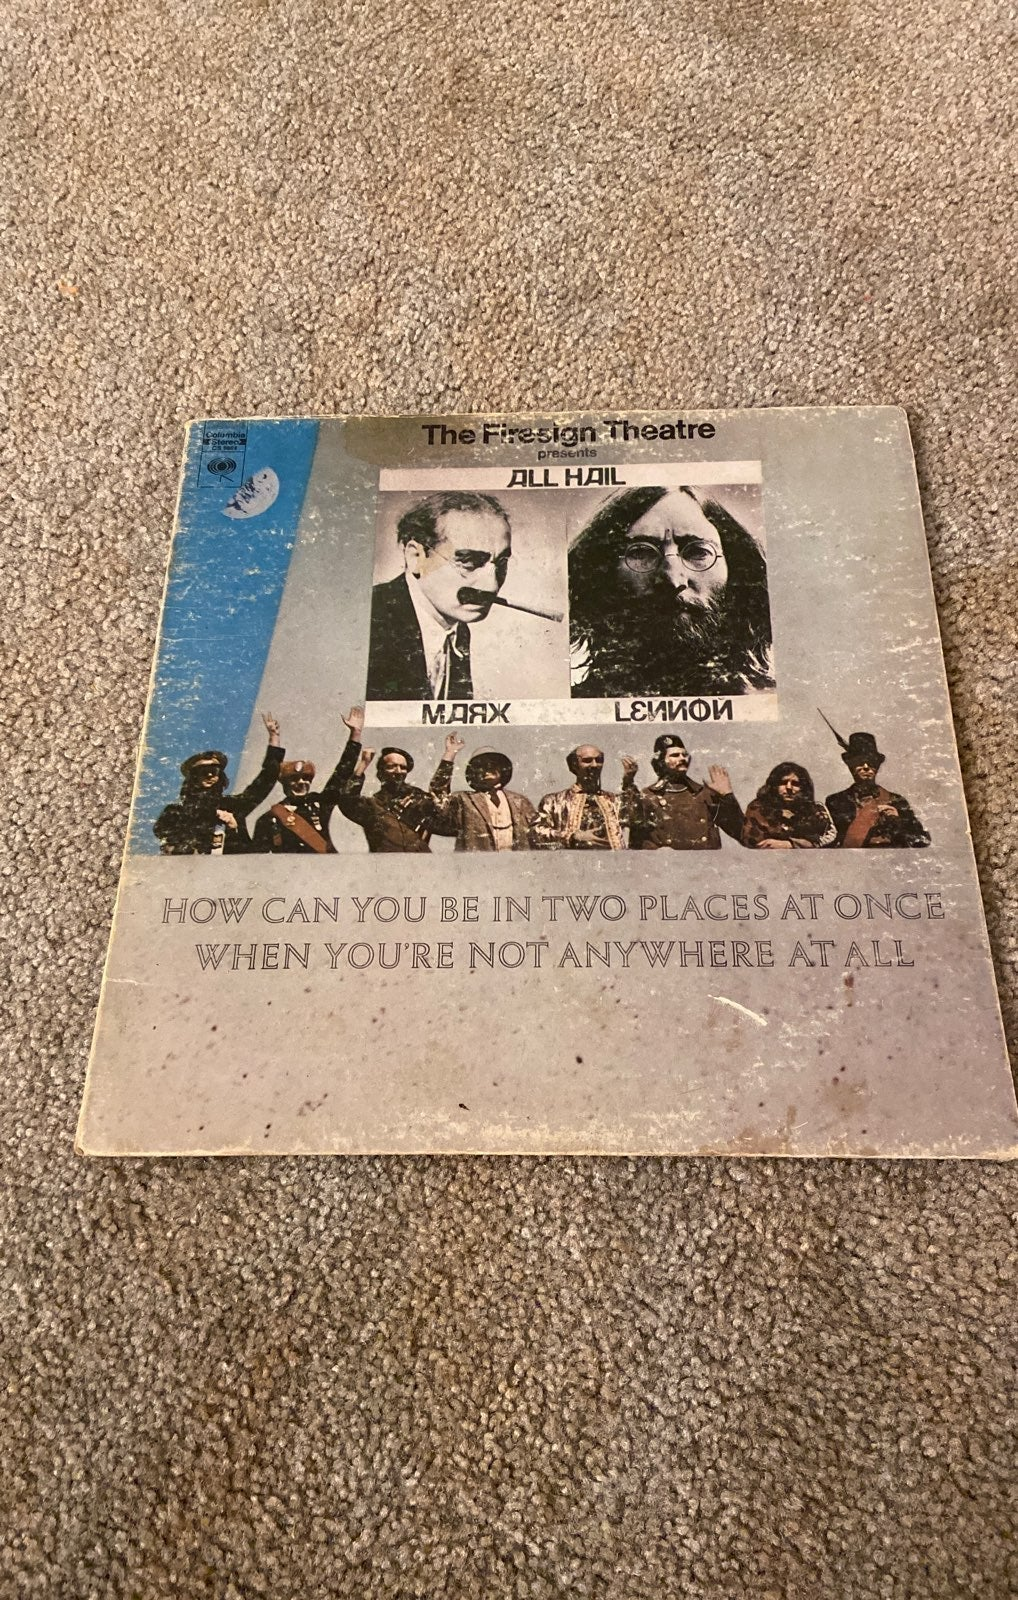 Hail Marx Lennon